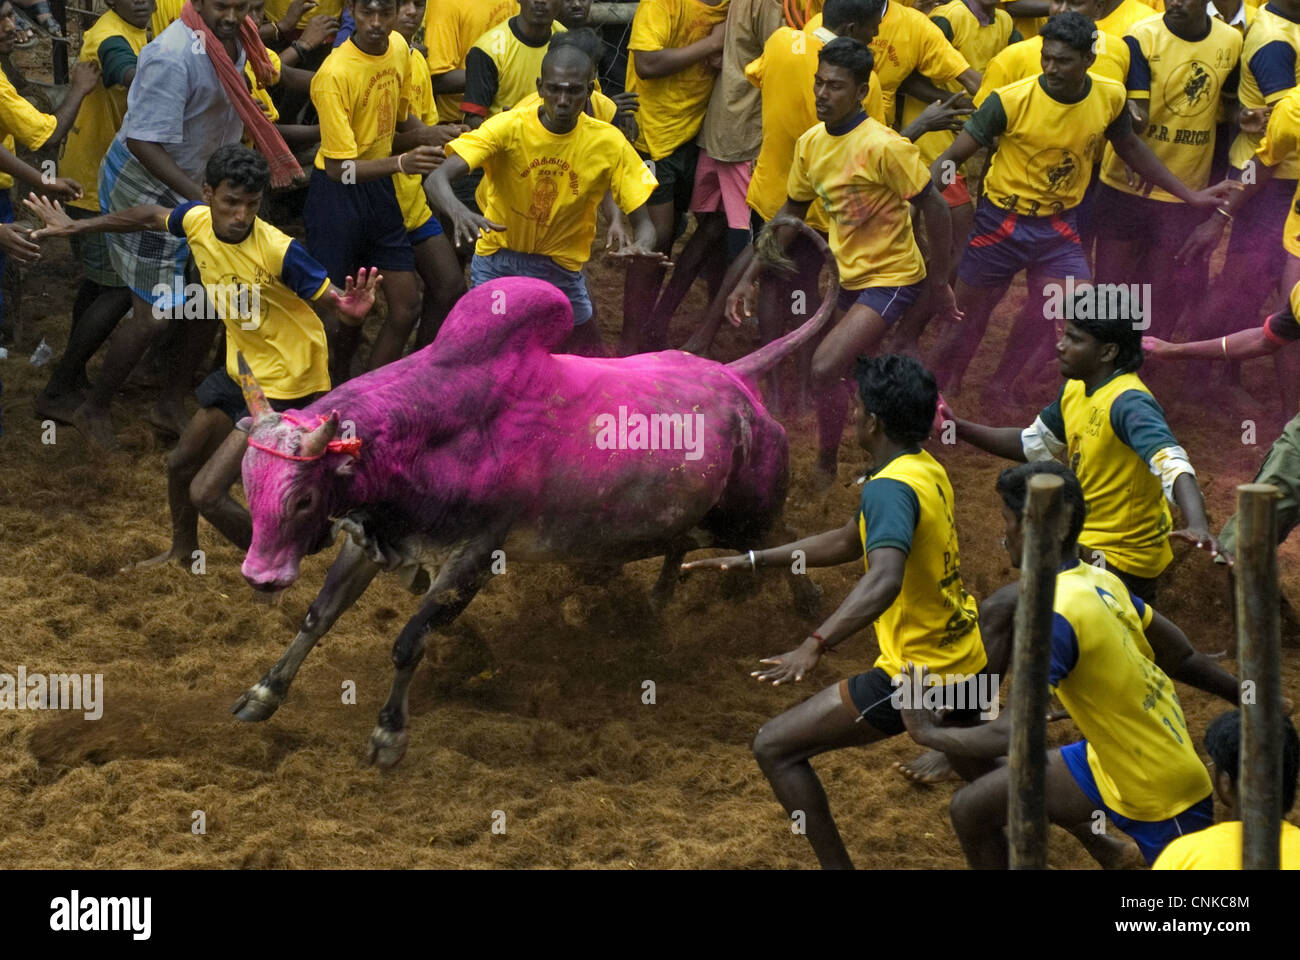 Domestic Cattle Zebu Bos indicus bull men attempting hold onto hump during 'Jallikattu' 'Taming Bull' - Stock Image